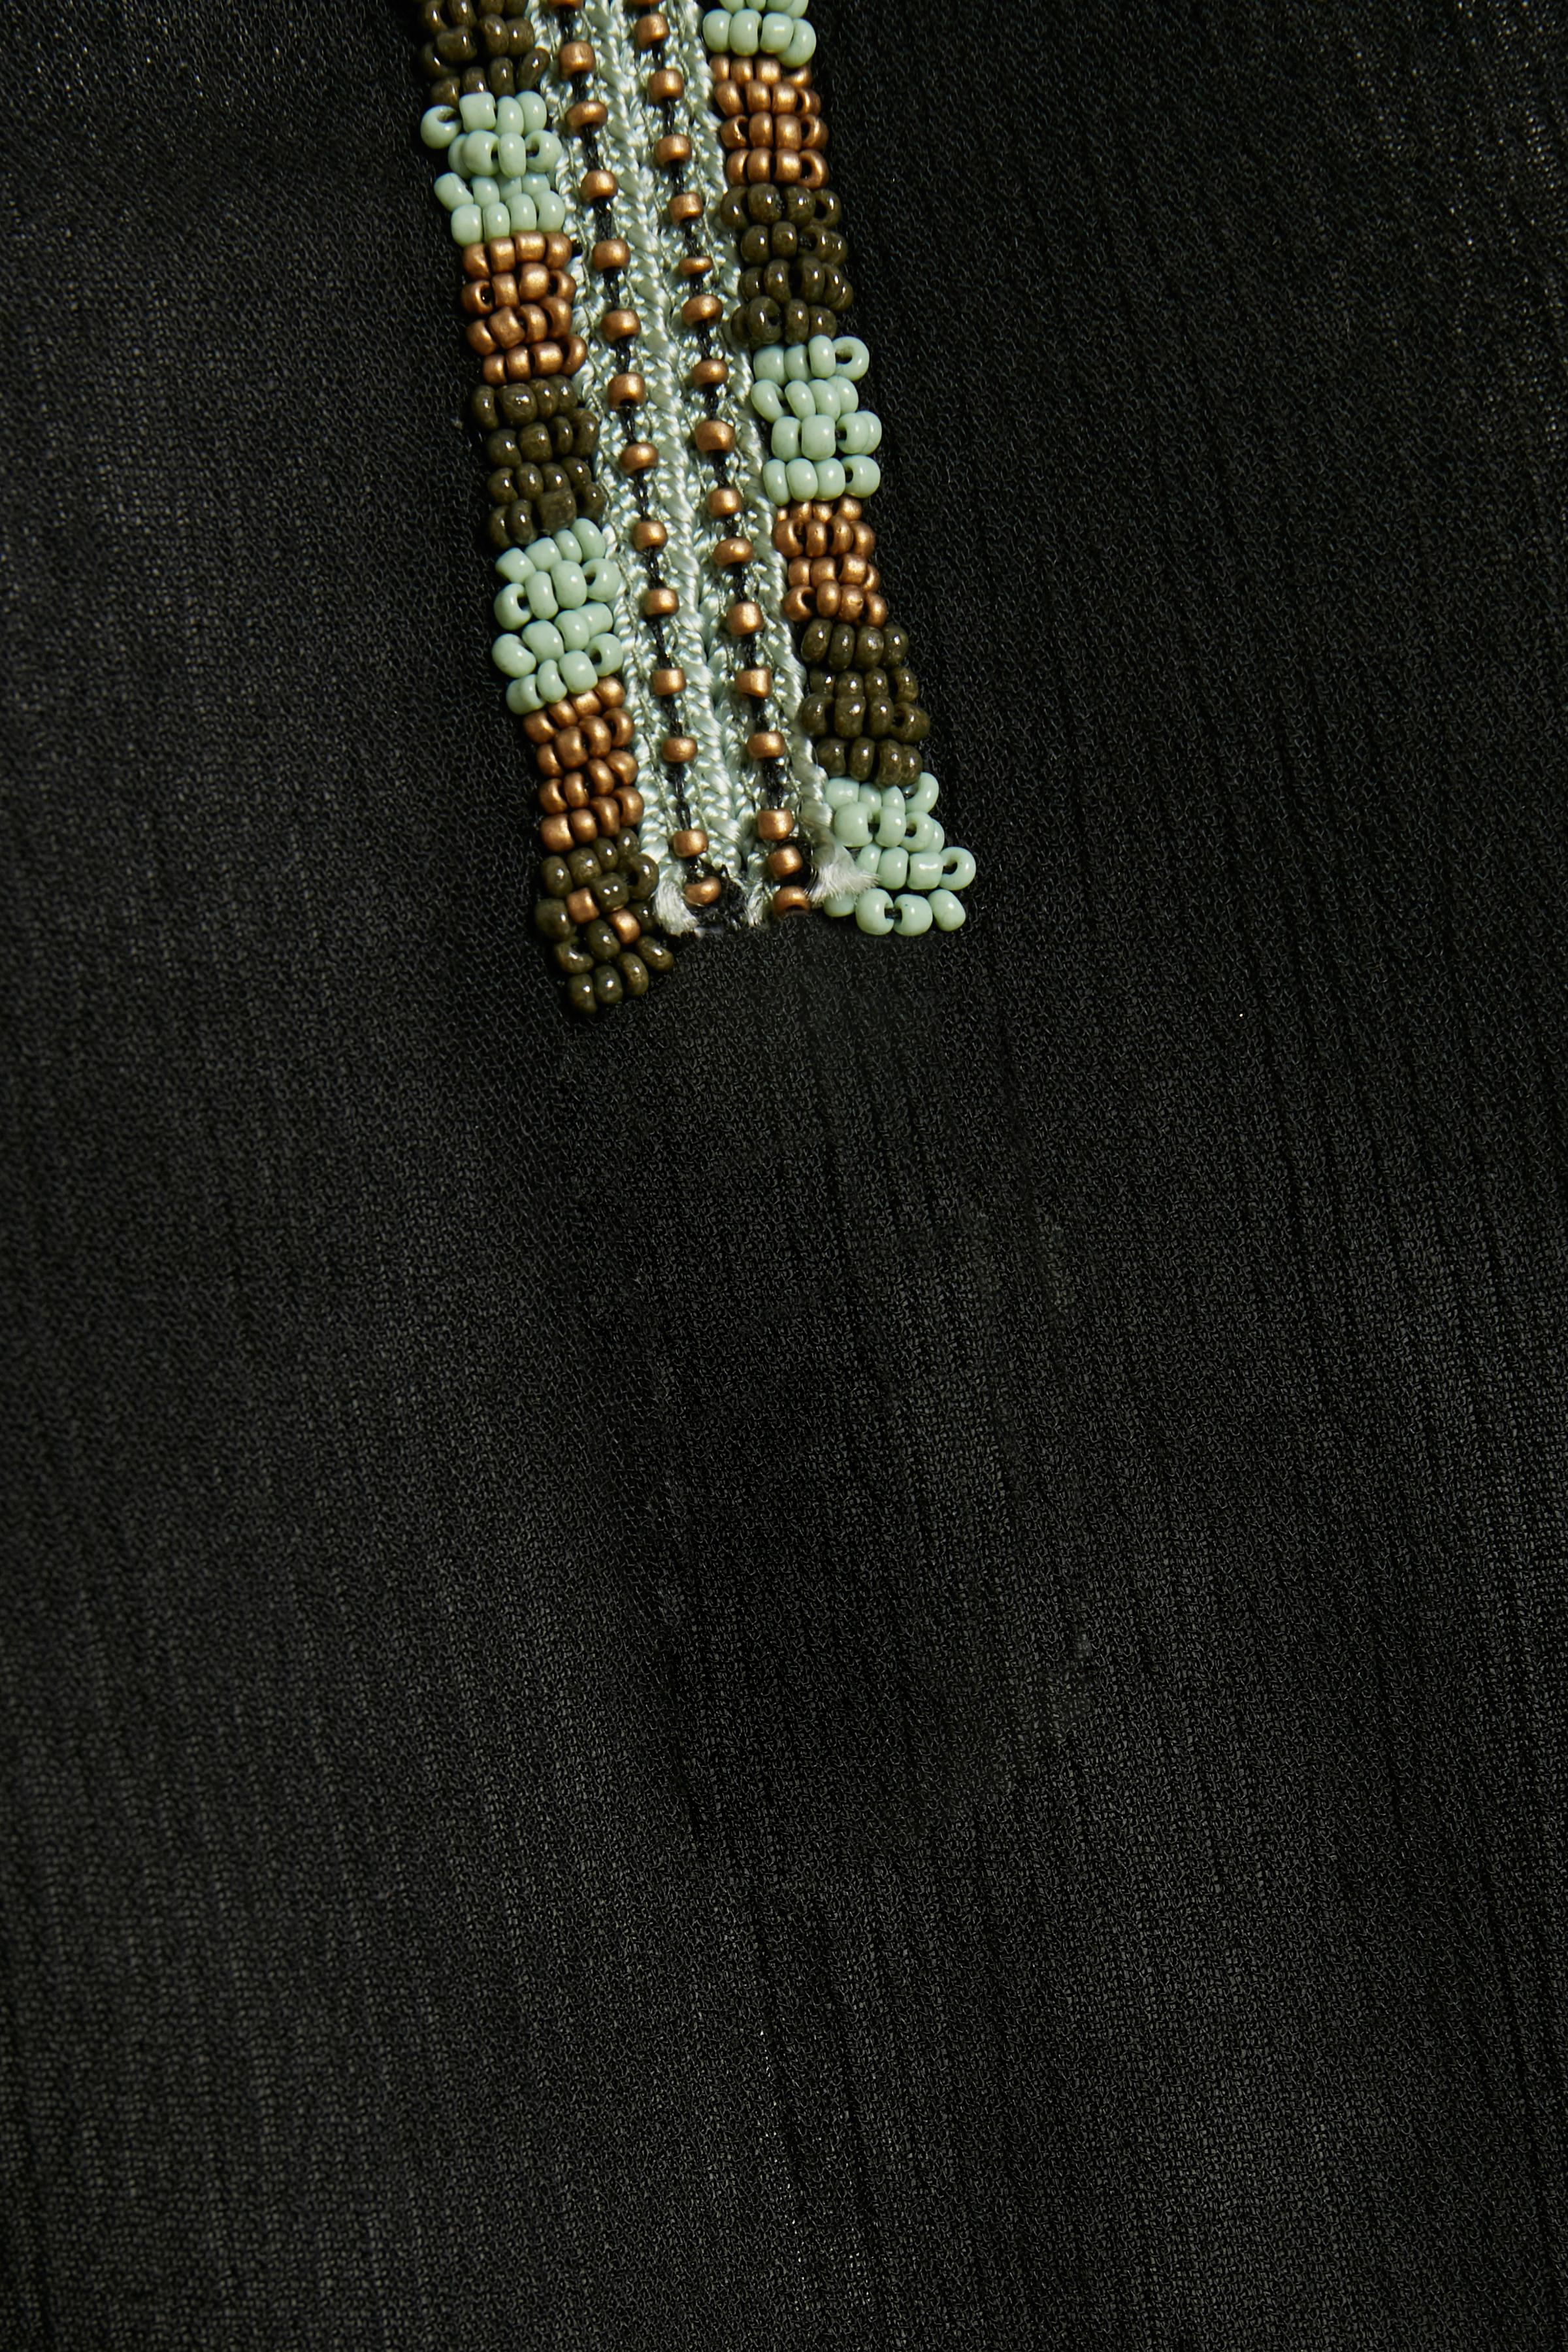 Svart Kortärmad blus  från Culture – Köp Svart Kortärmad blus  från stl. XS-XXL här